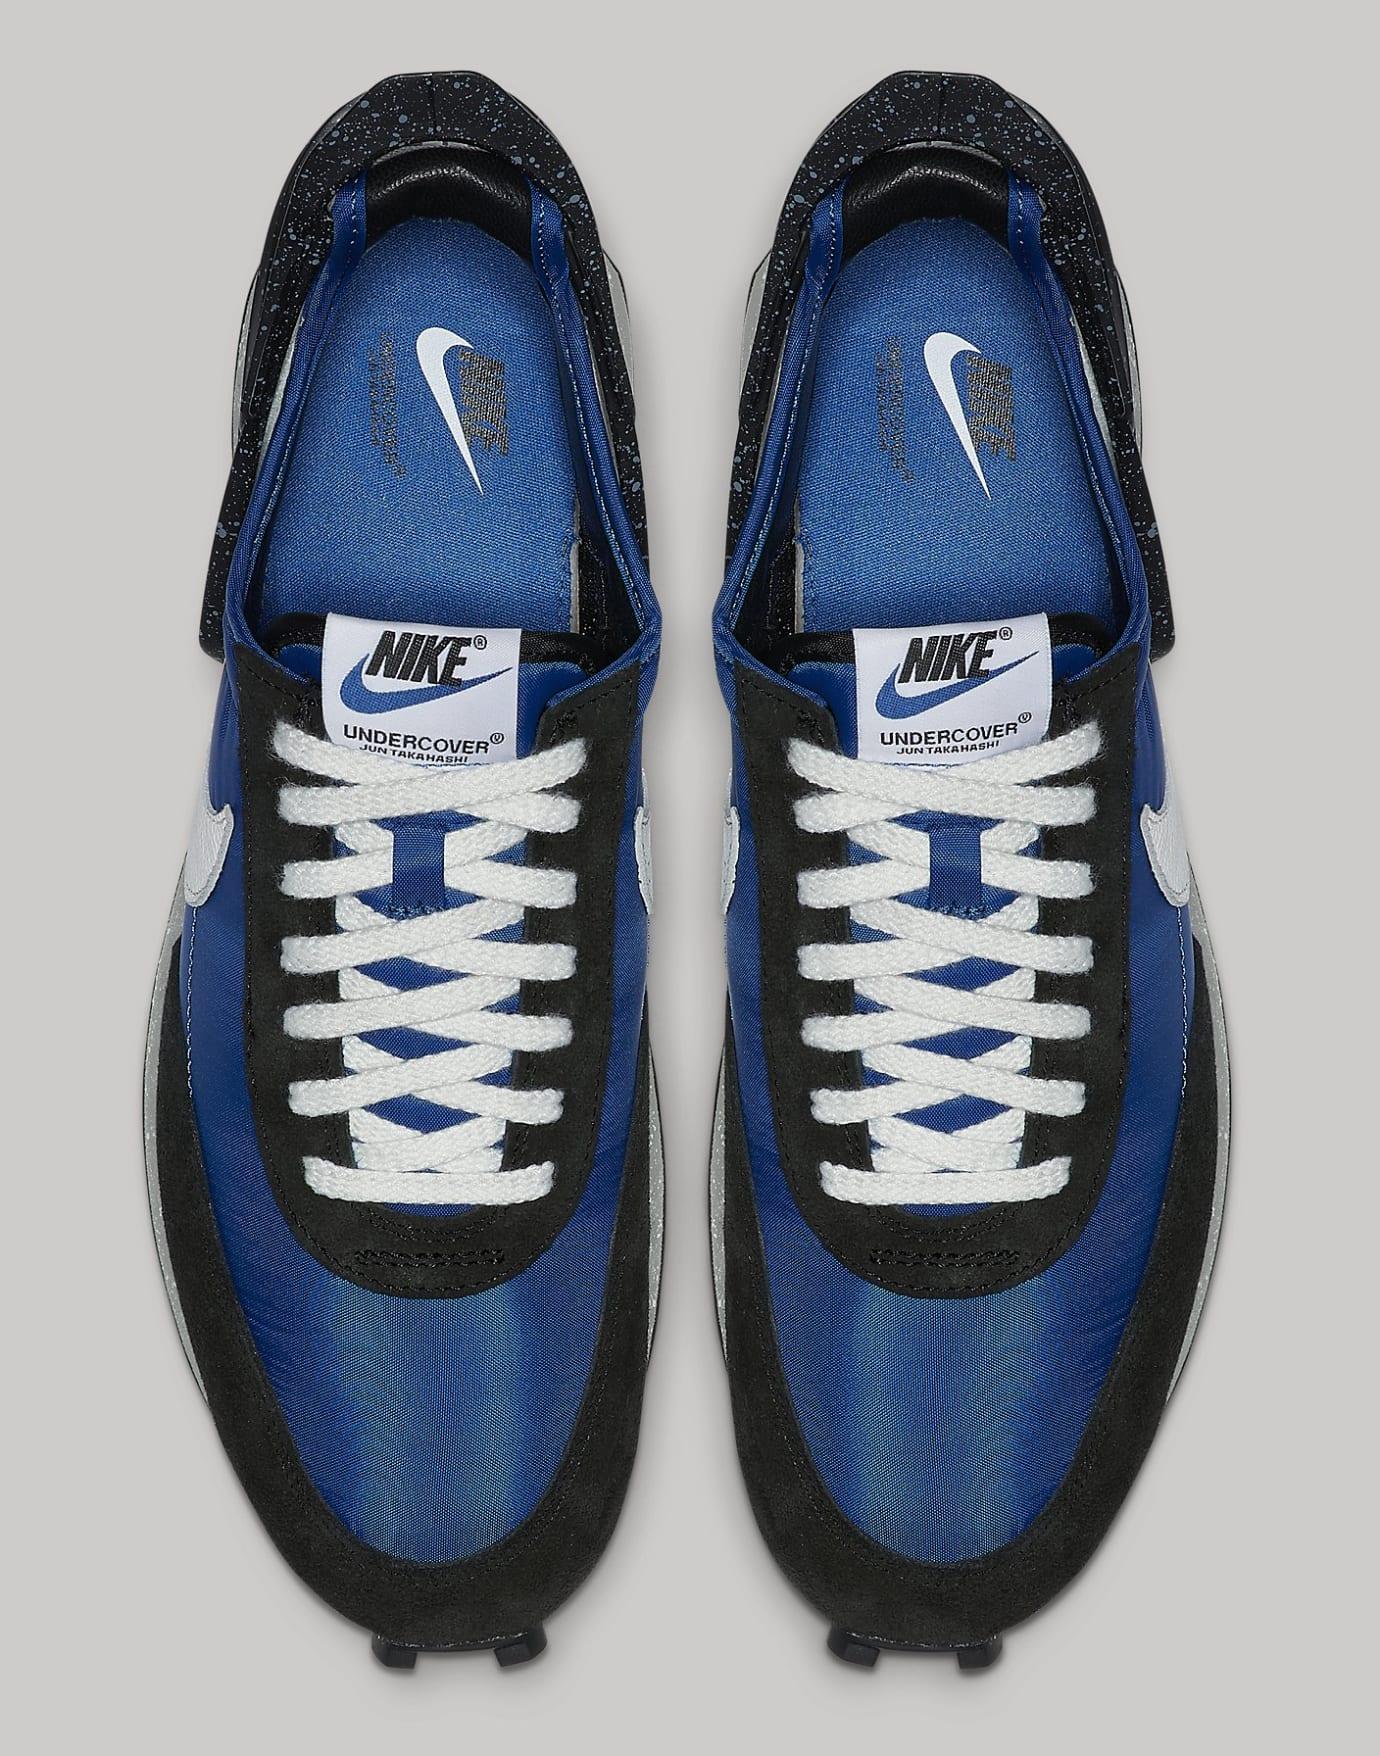 Undercover x Nike Daybreak Blue Jay/Summit White-Black BV4594-400 Top